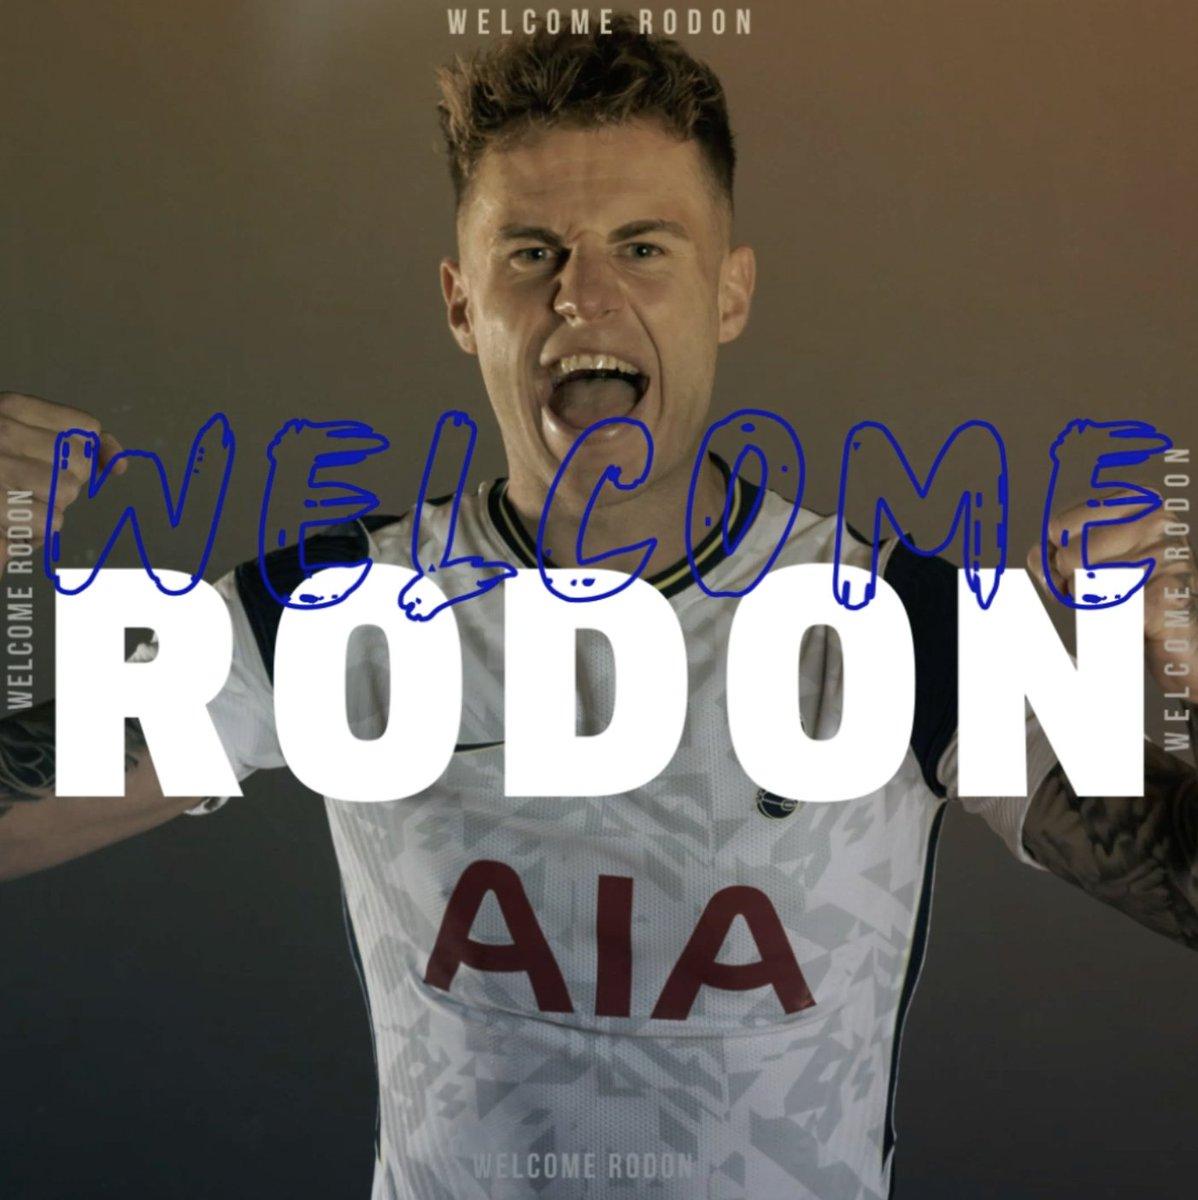 @Spurs_ES's photo on Rodon